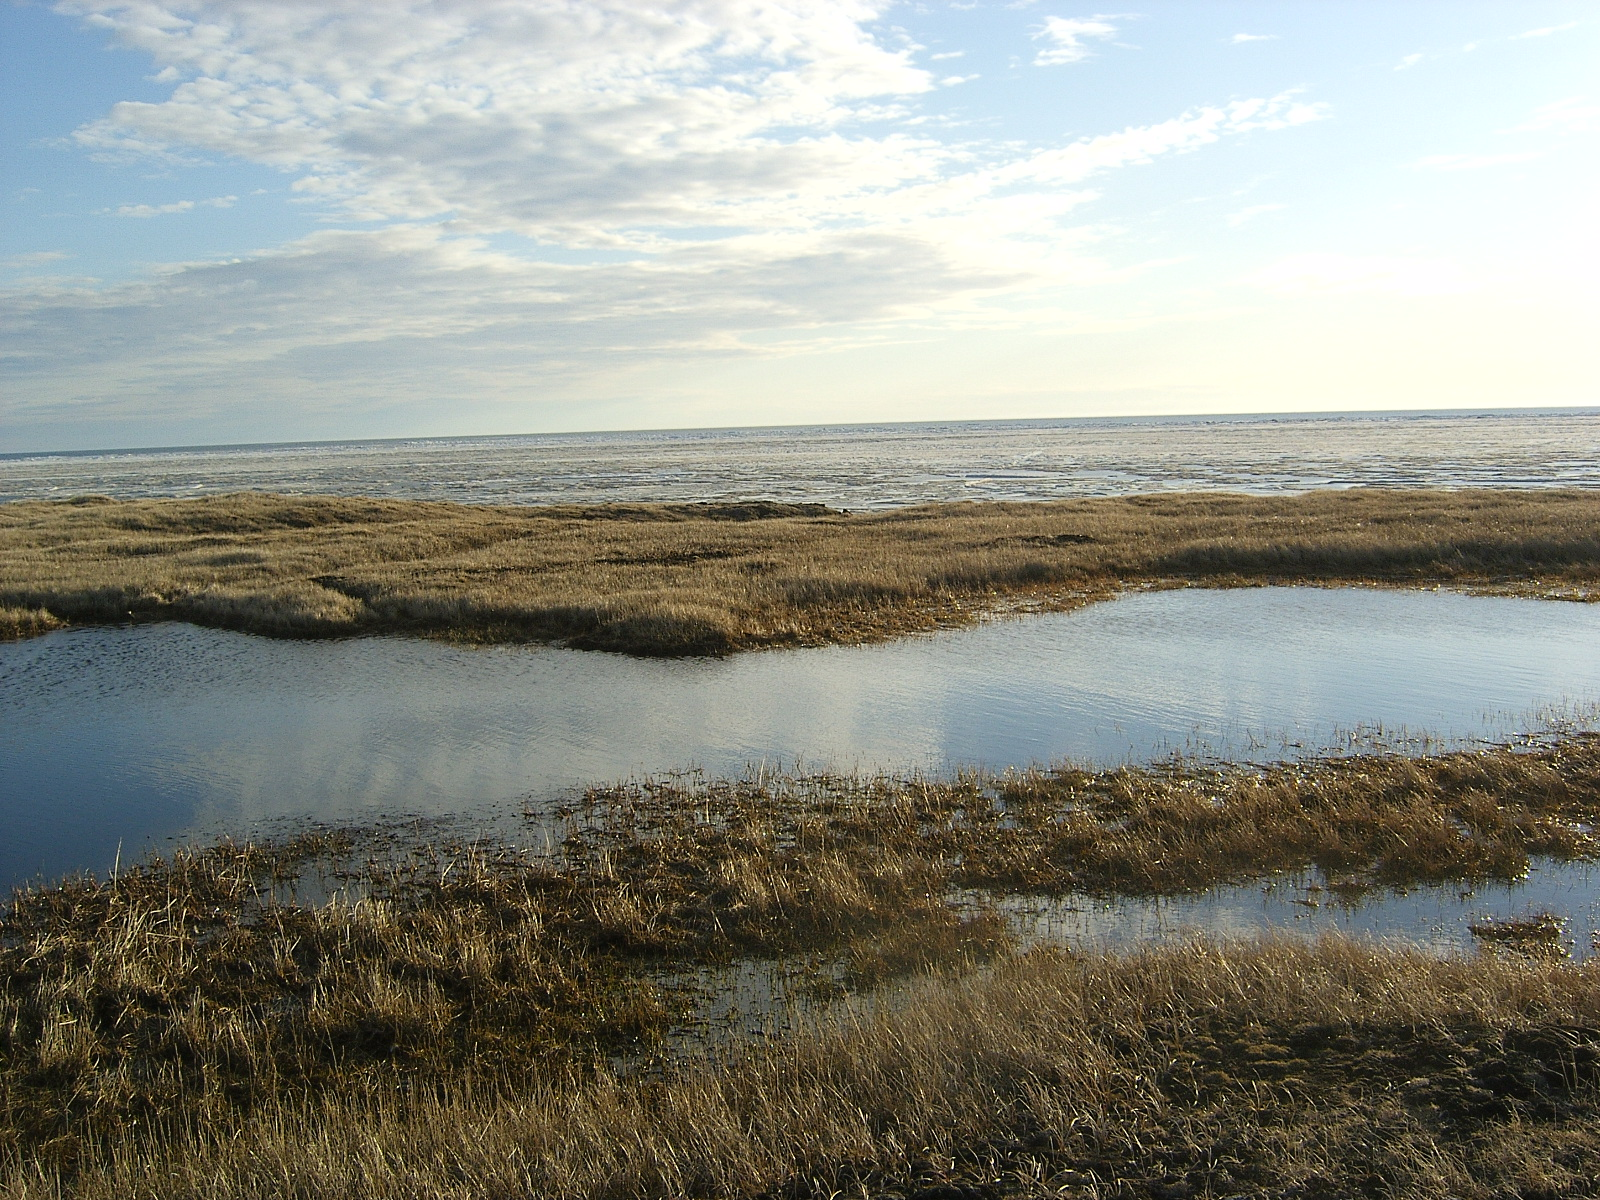 Sea pond sky 2 by Arctic-Stock